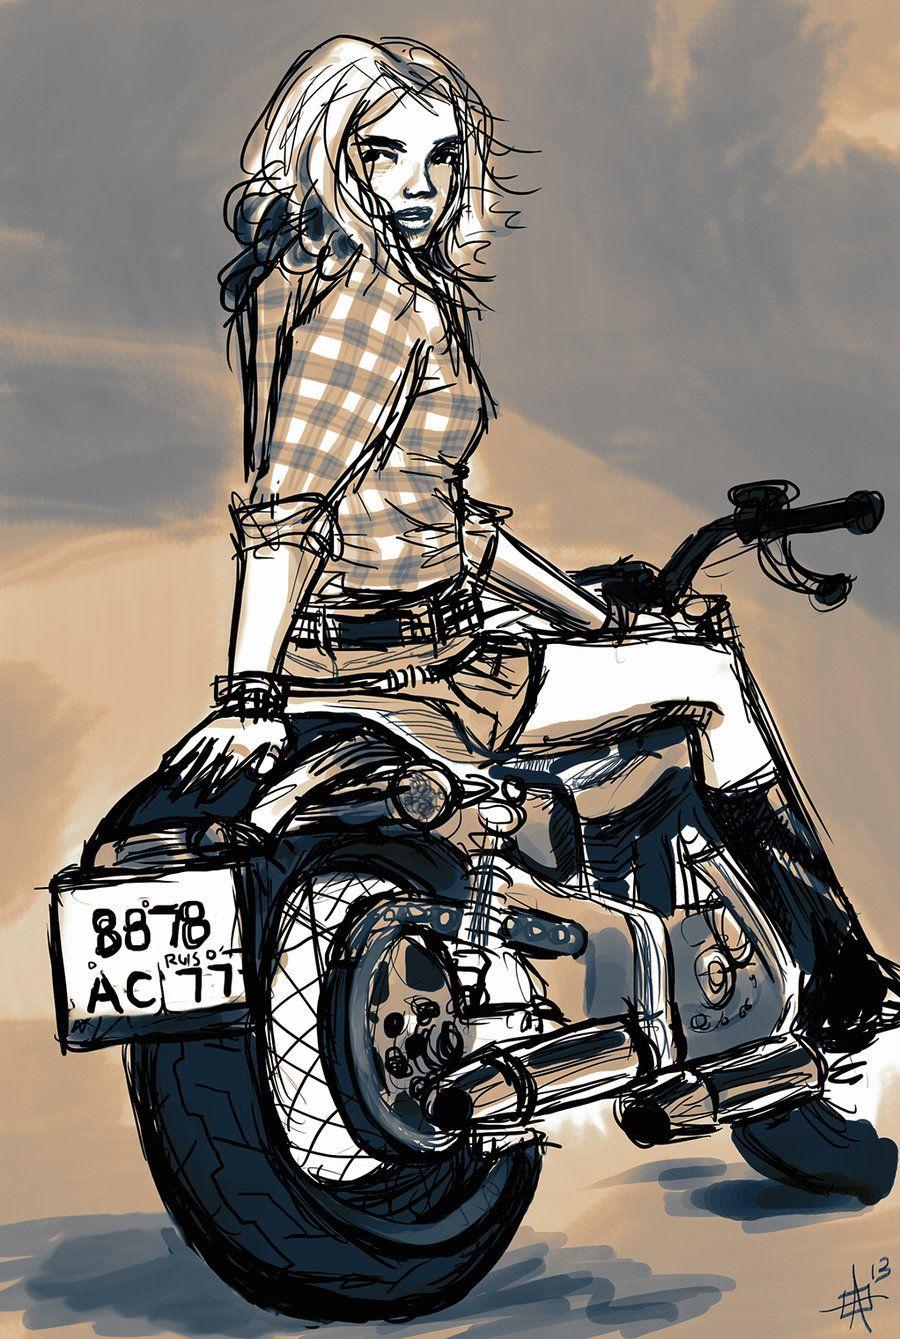 Harley Davidson Art Print Of Original Art Vintage Bike With Pinup Girl